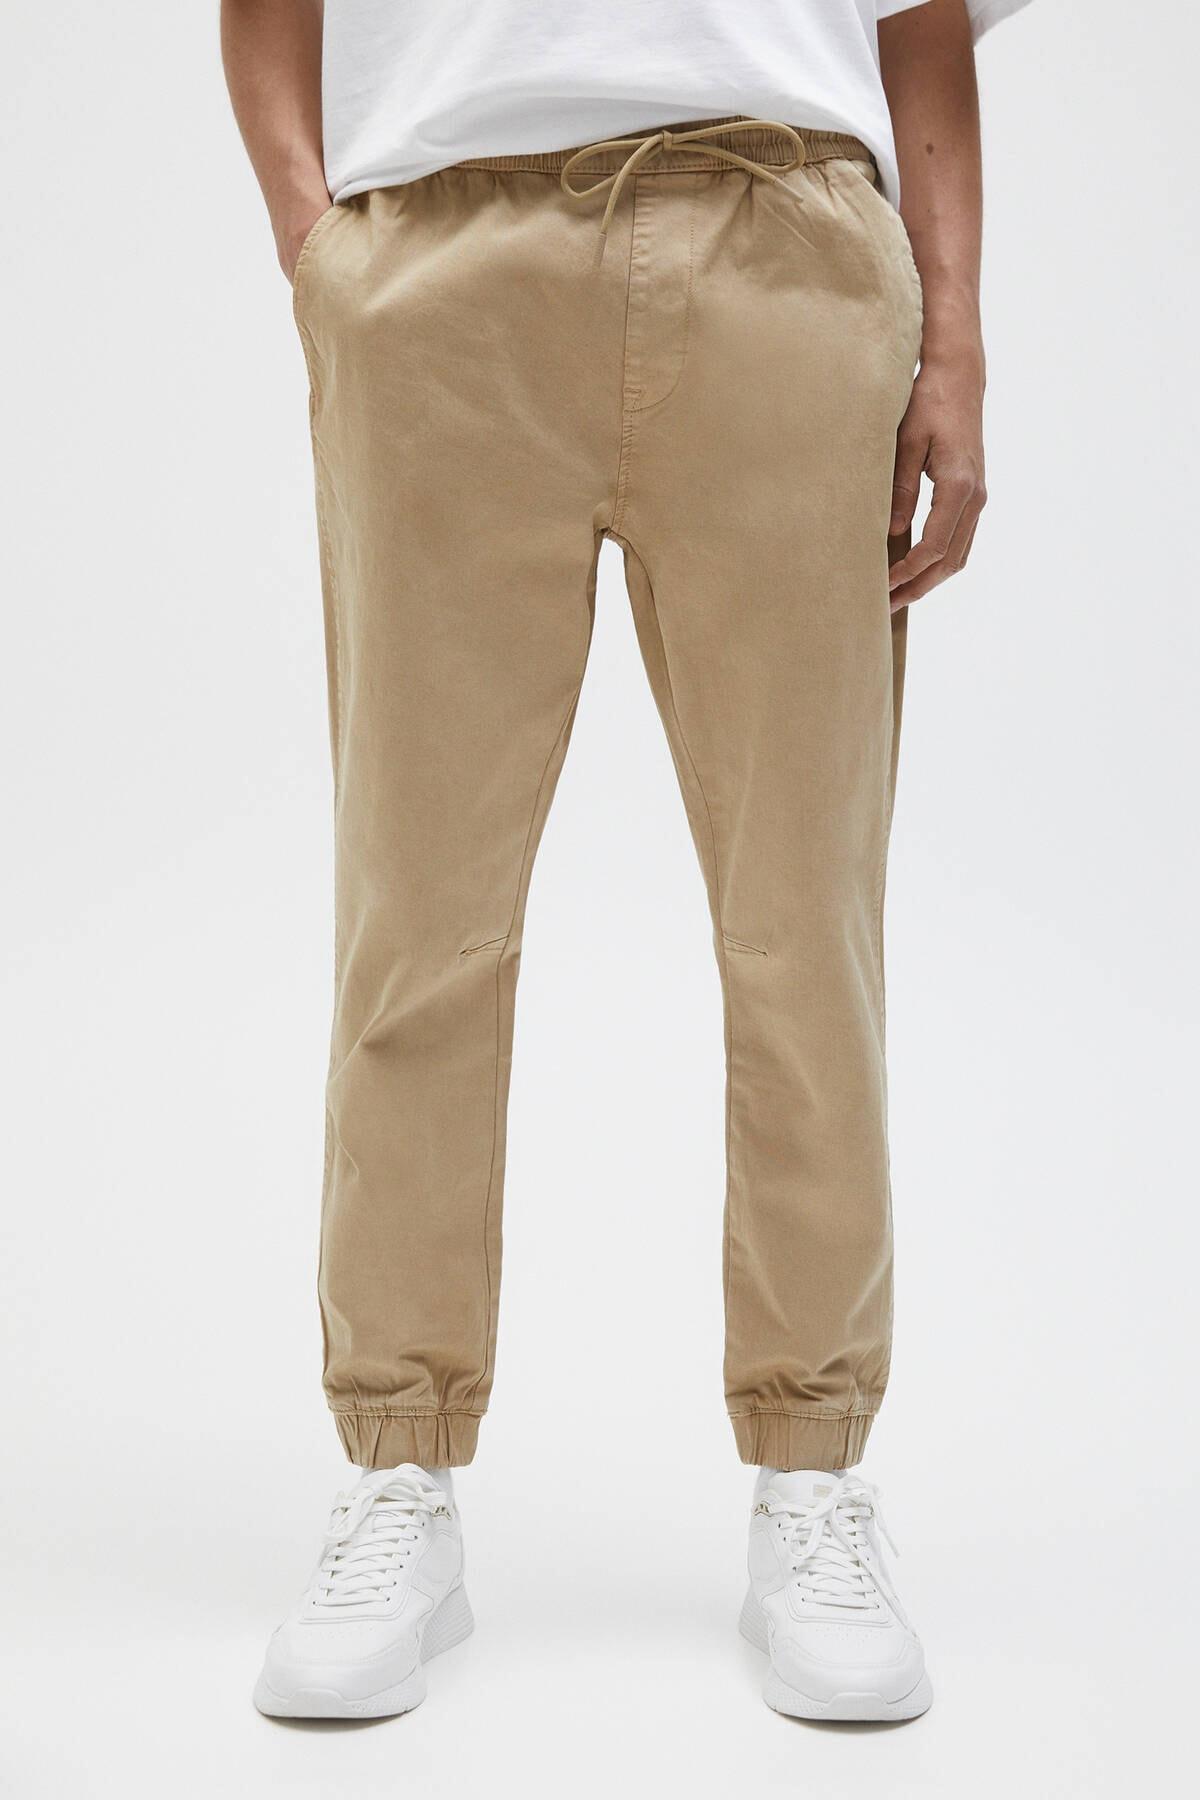 Pull & Bear Erkek Bej Büzgü İpli Basic Jogging Fit Pantolon - En Az %50 Organik Pamuklu 04676525 2